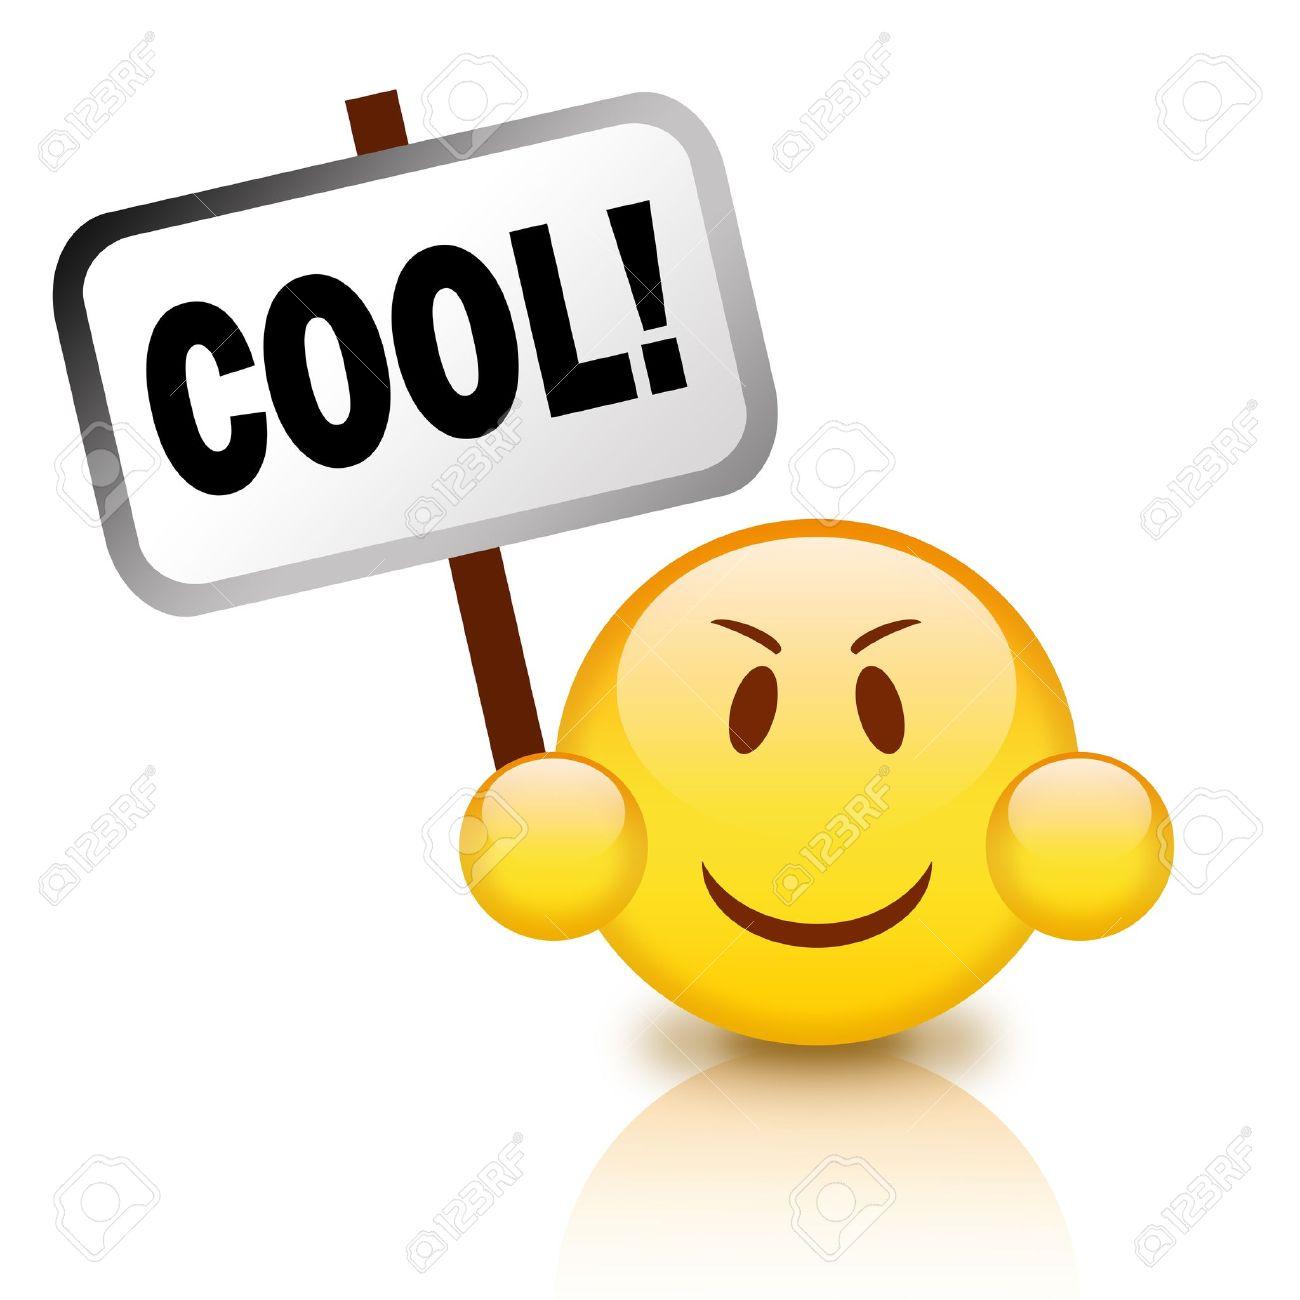 Cool emoticon Stock Photo - 9396078